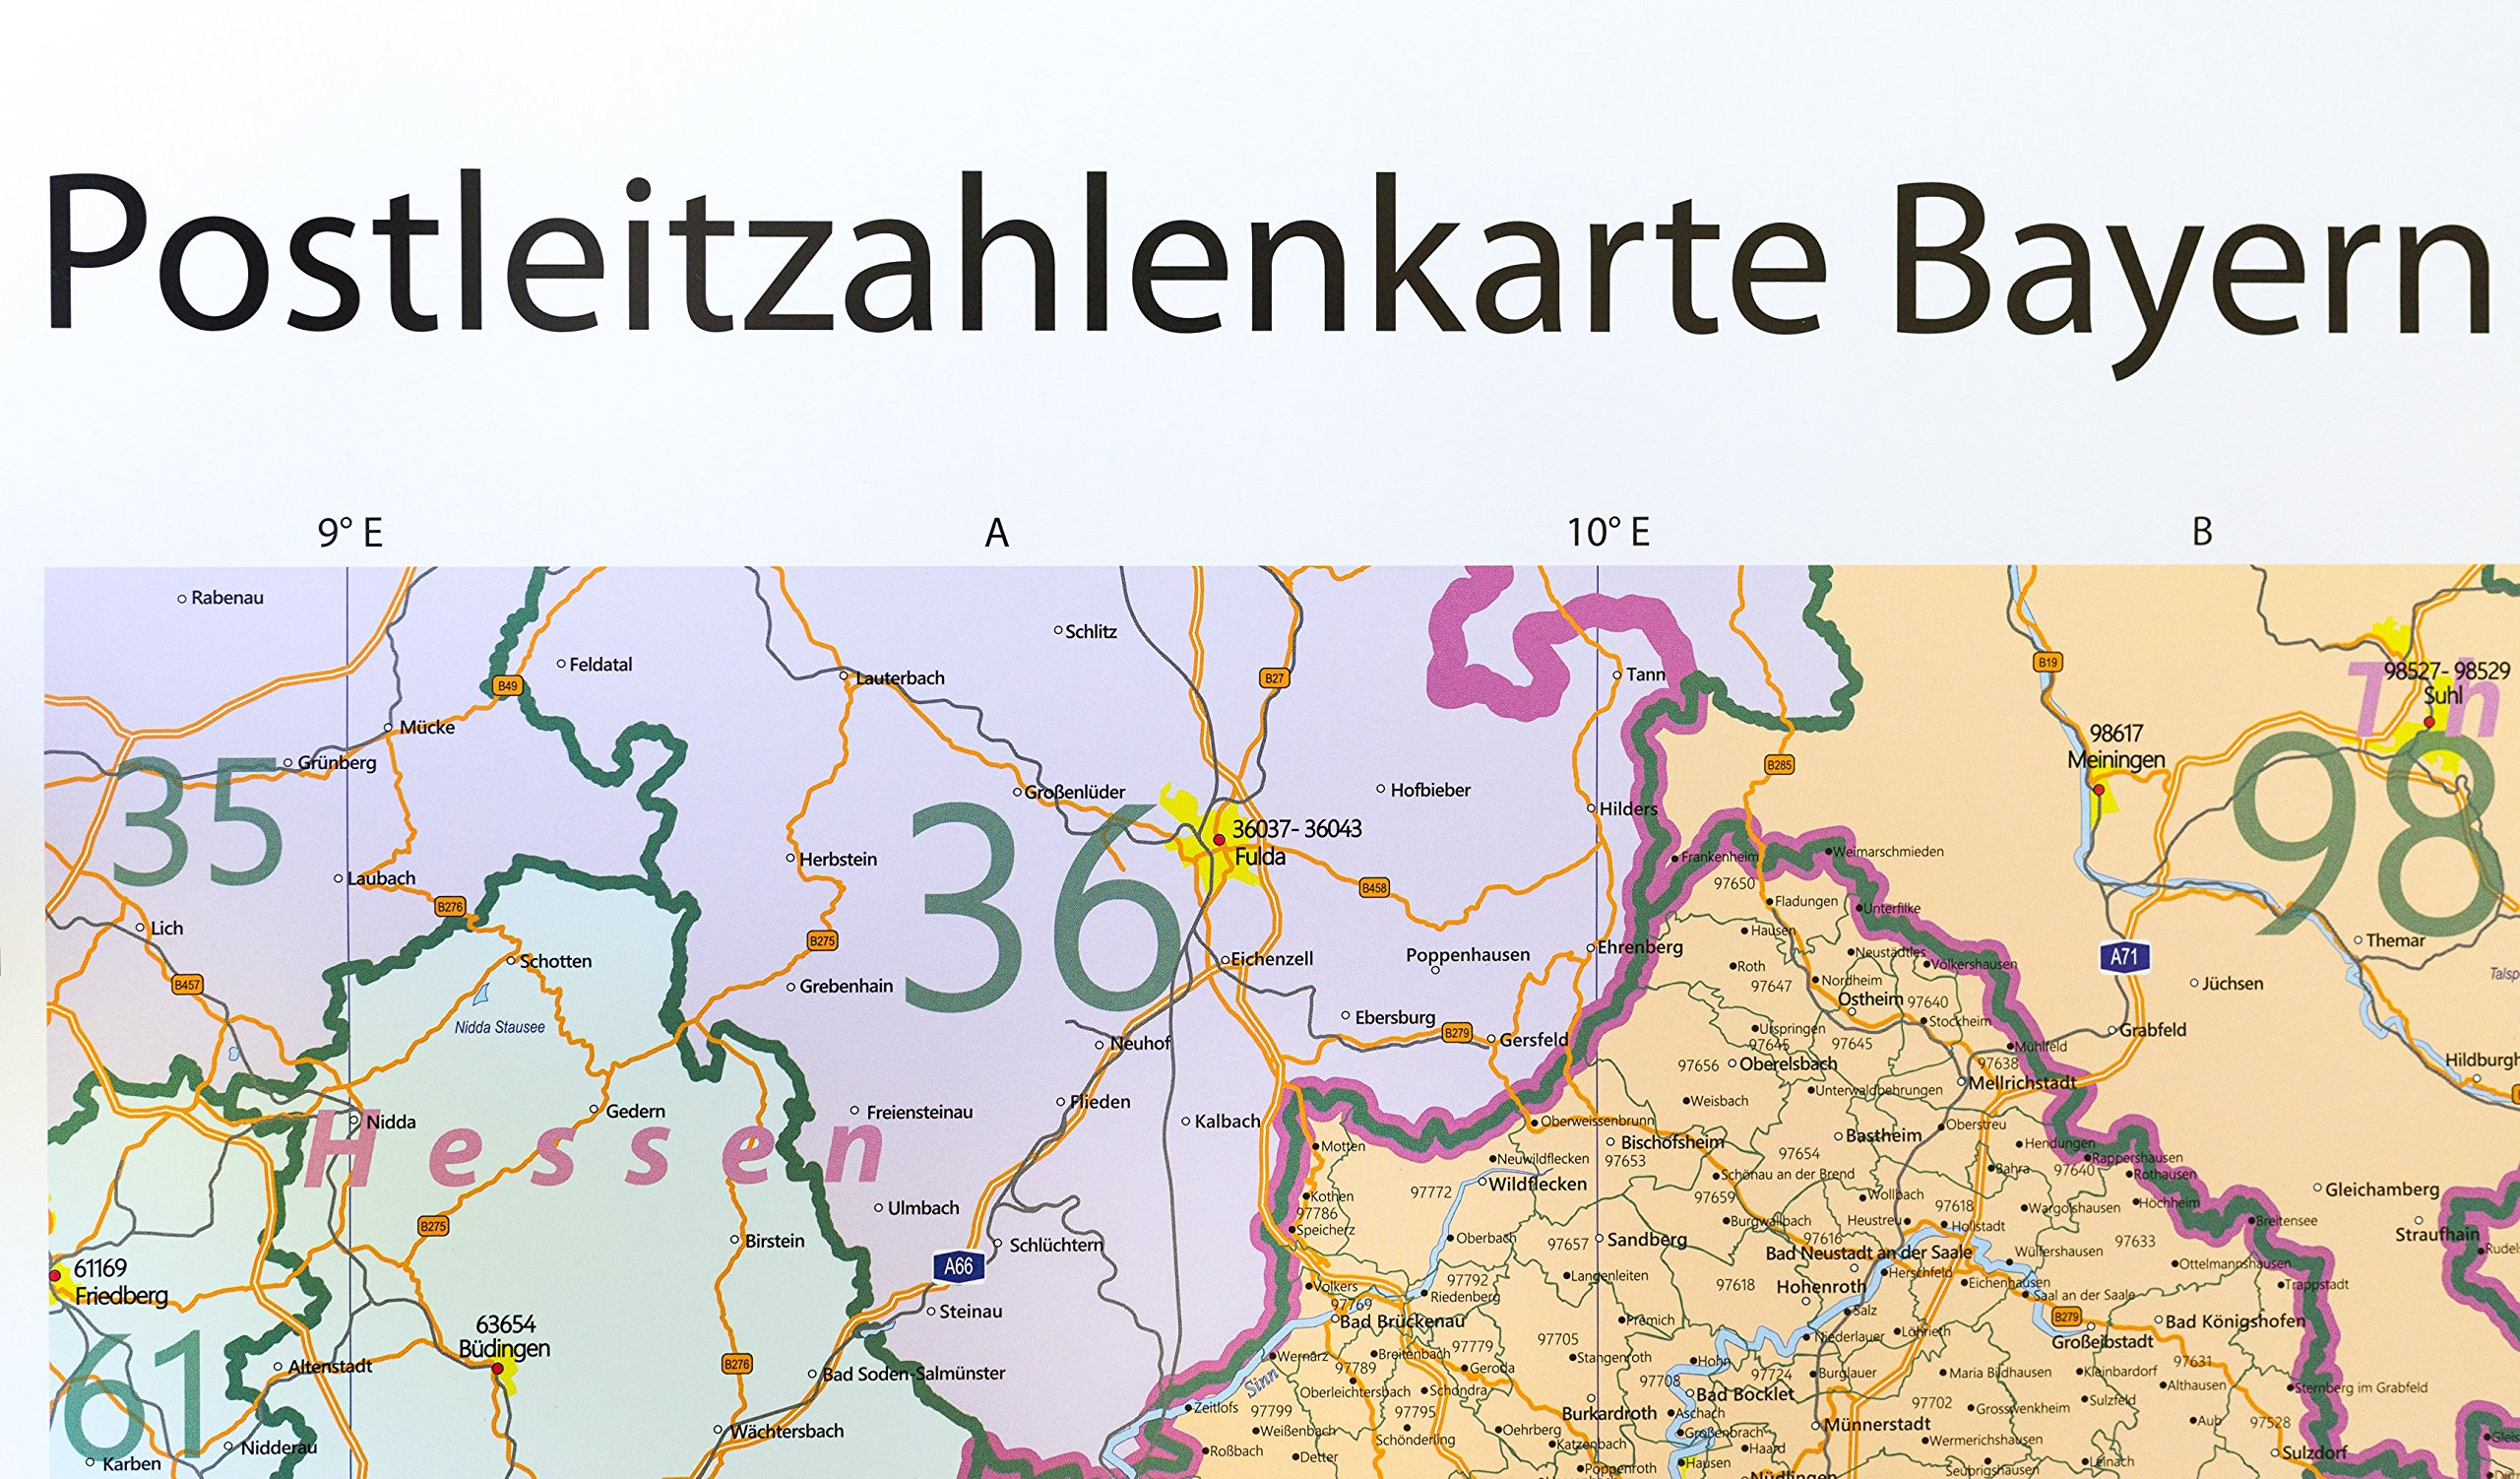 Plz Karte Bayern.Postleitzahlenkarte Bayern Xl 1 400 000 Gerollt 5 Stellige Plz